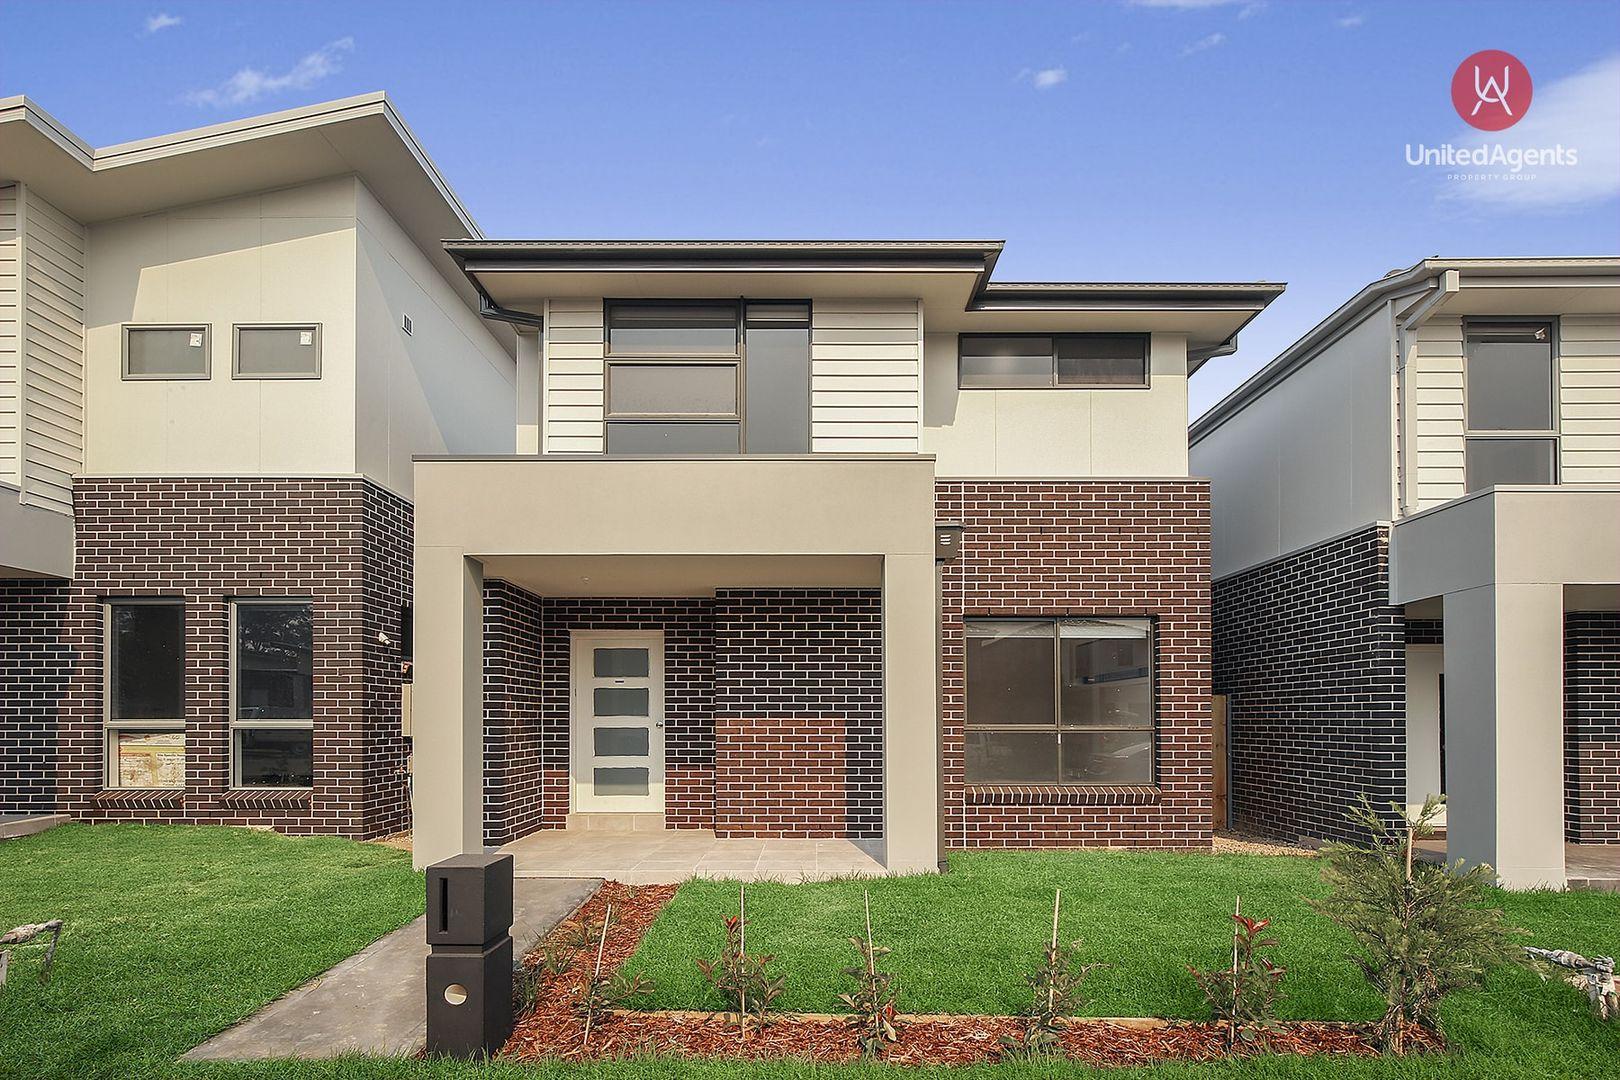 40/Lot 59 Connemara Street, Austral NSW 2179, Image 0